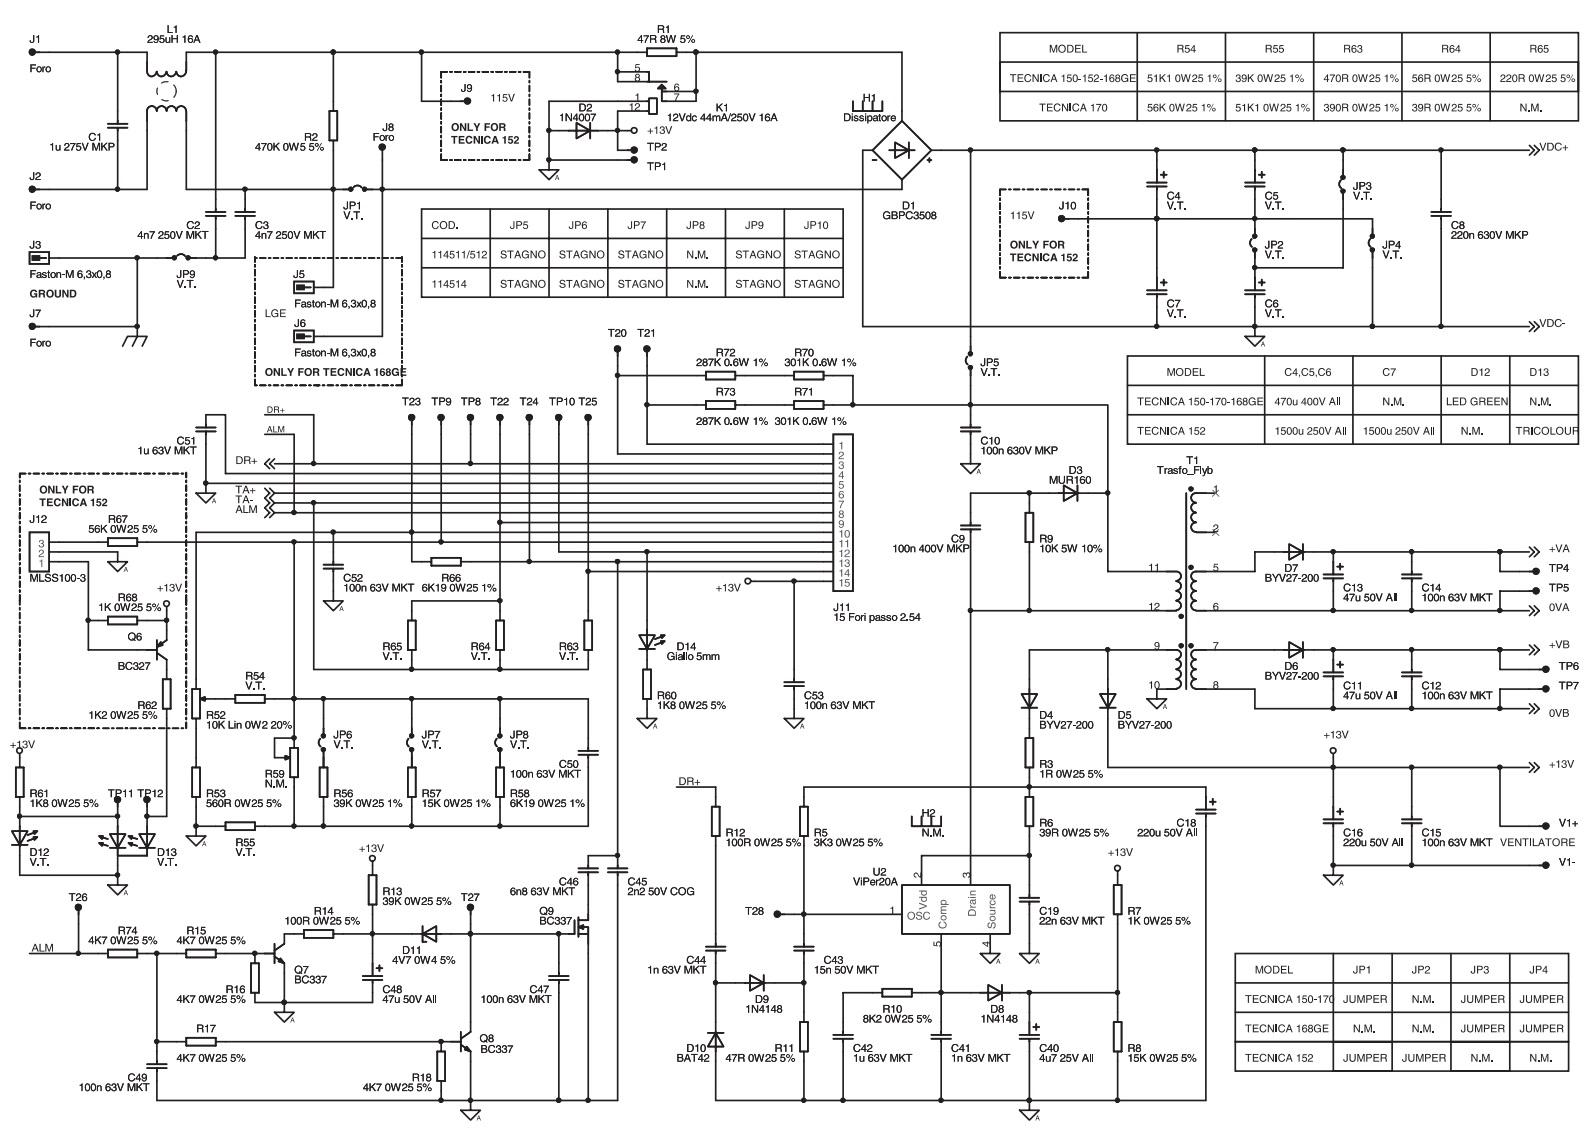 Electronic Inspirations  Telwin Technica 150 Inverter For Welding  U2013 Schematic  U2013 Part 2 Of 2